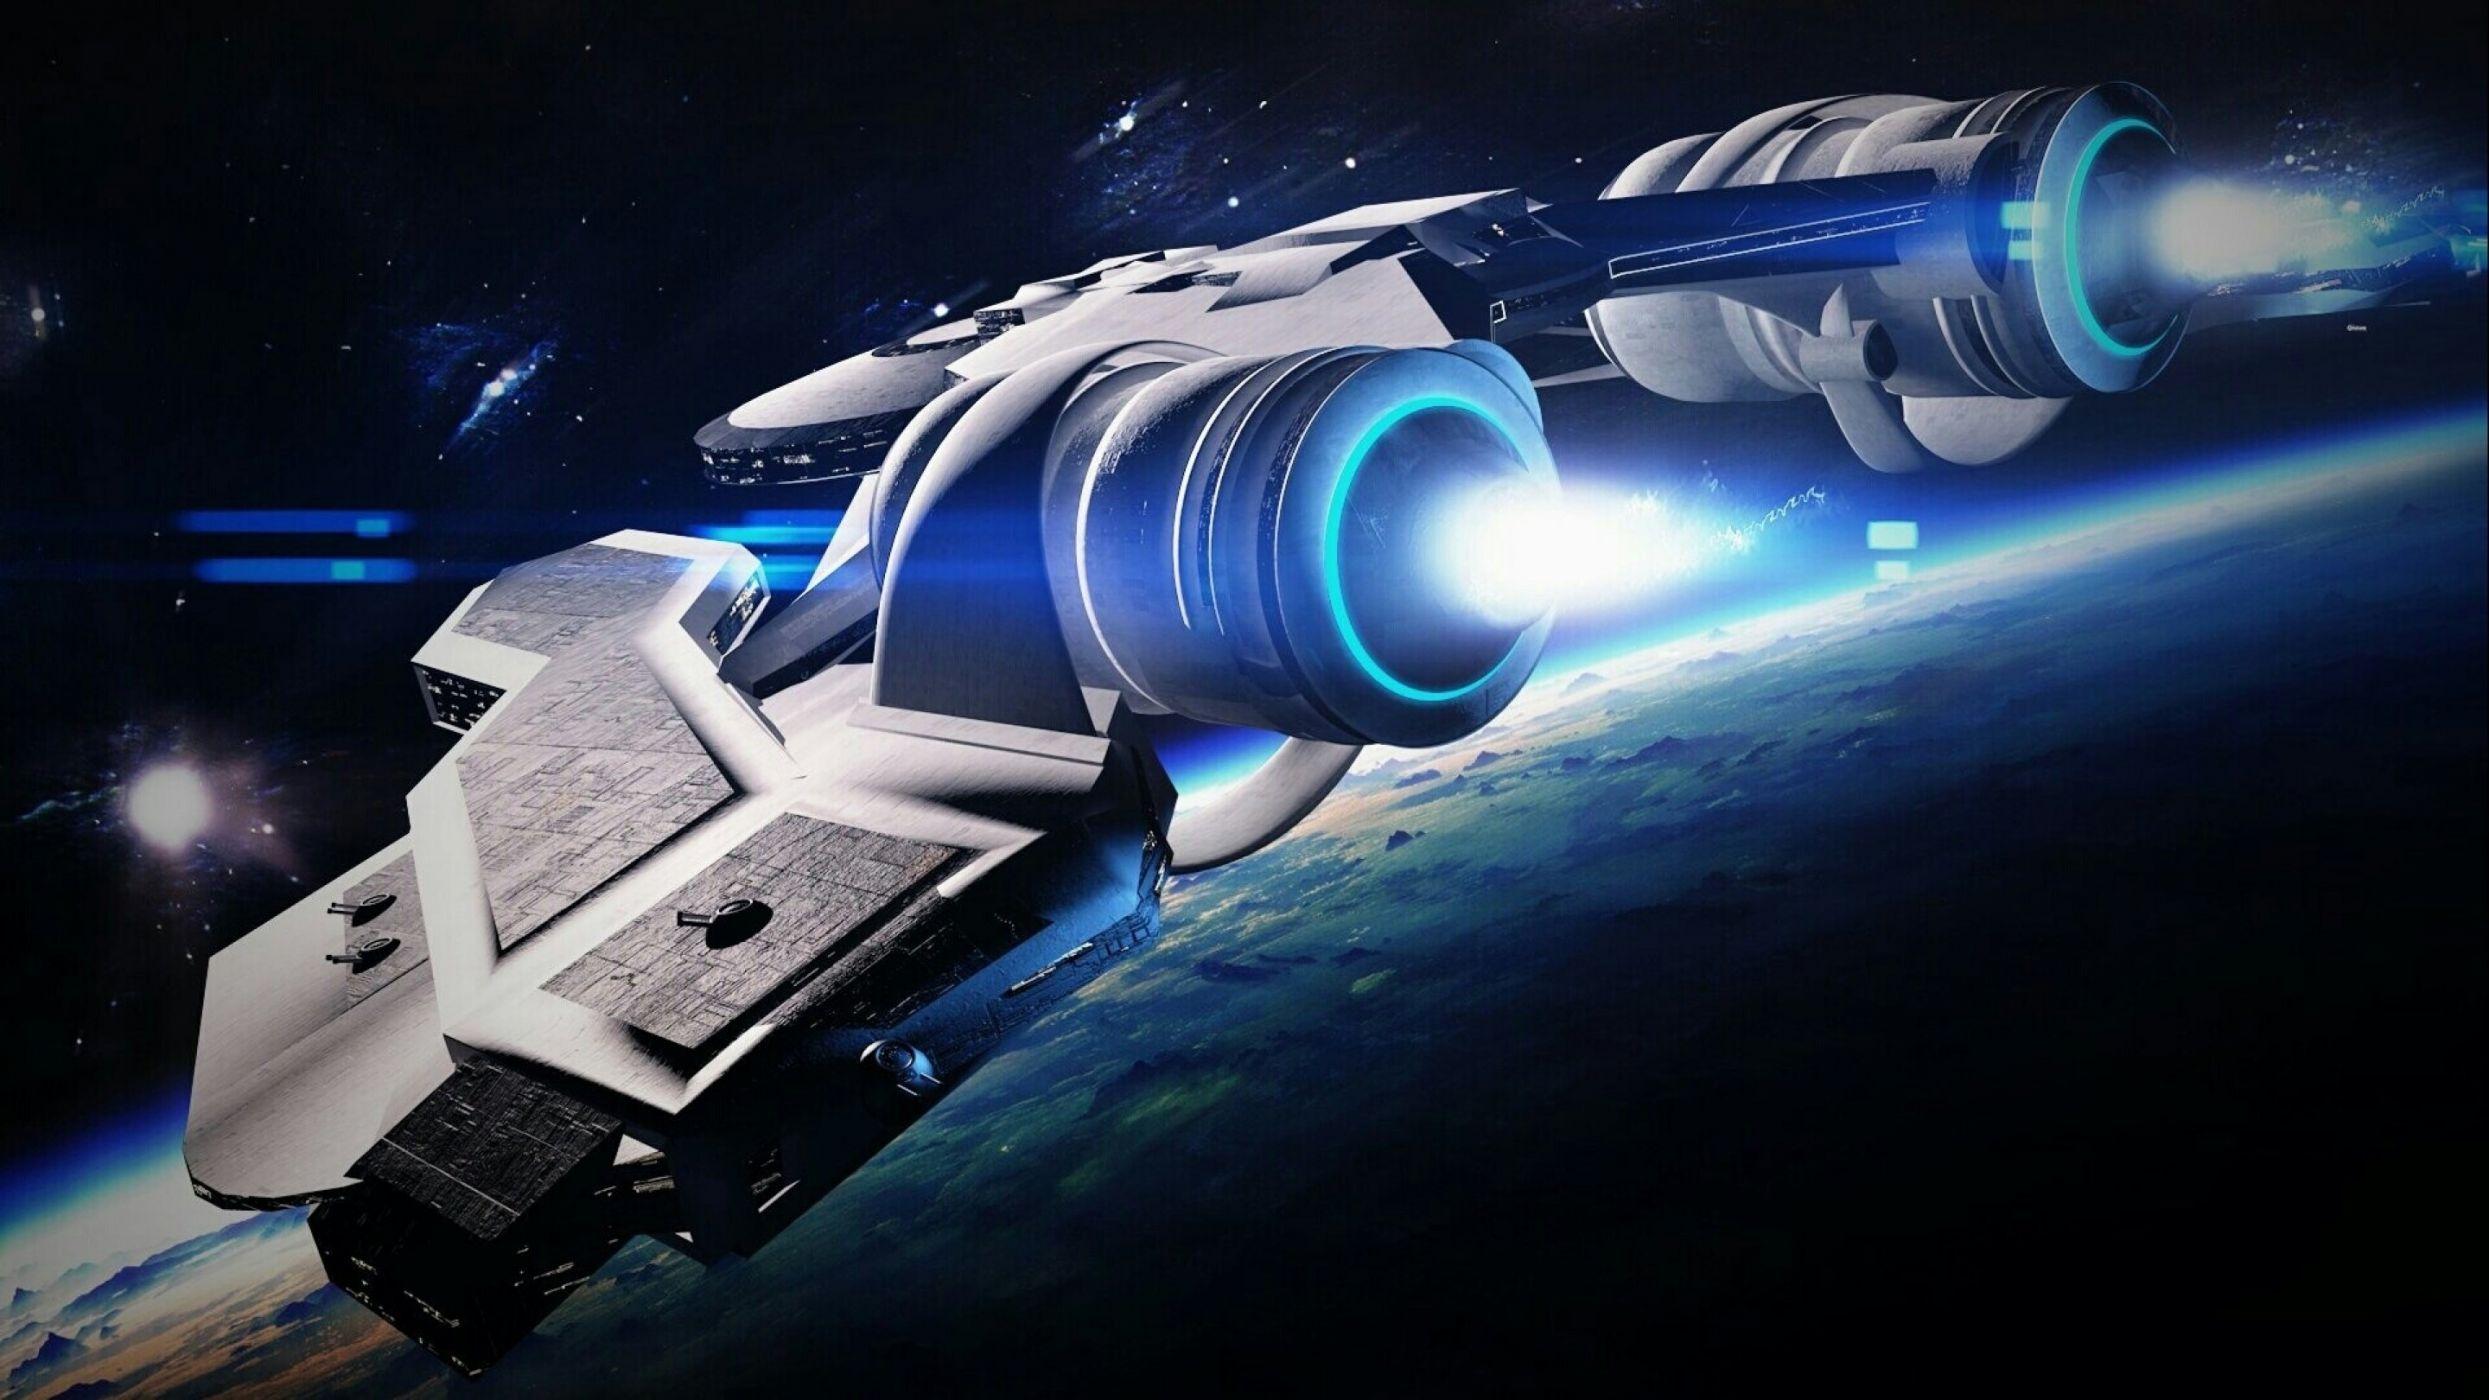 future rocket ship - HD2489×1400